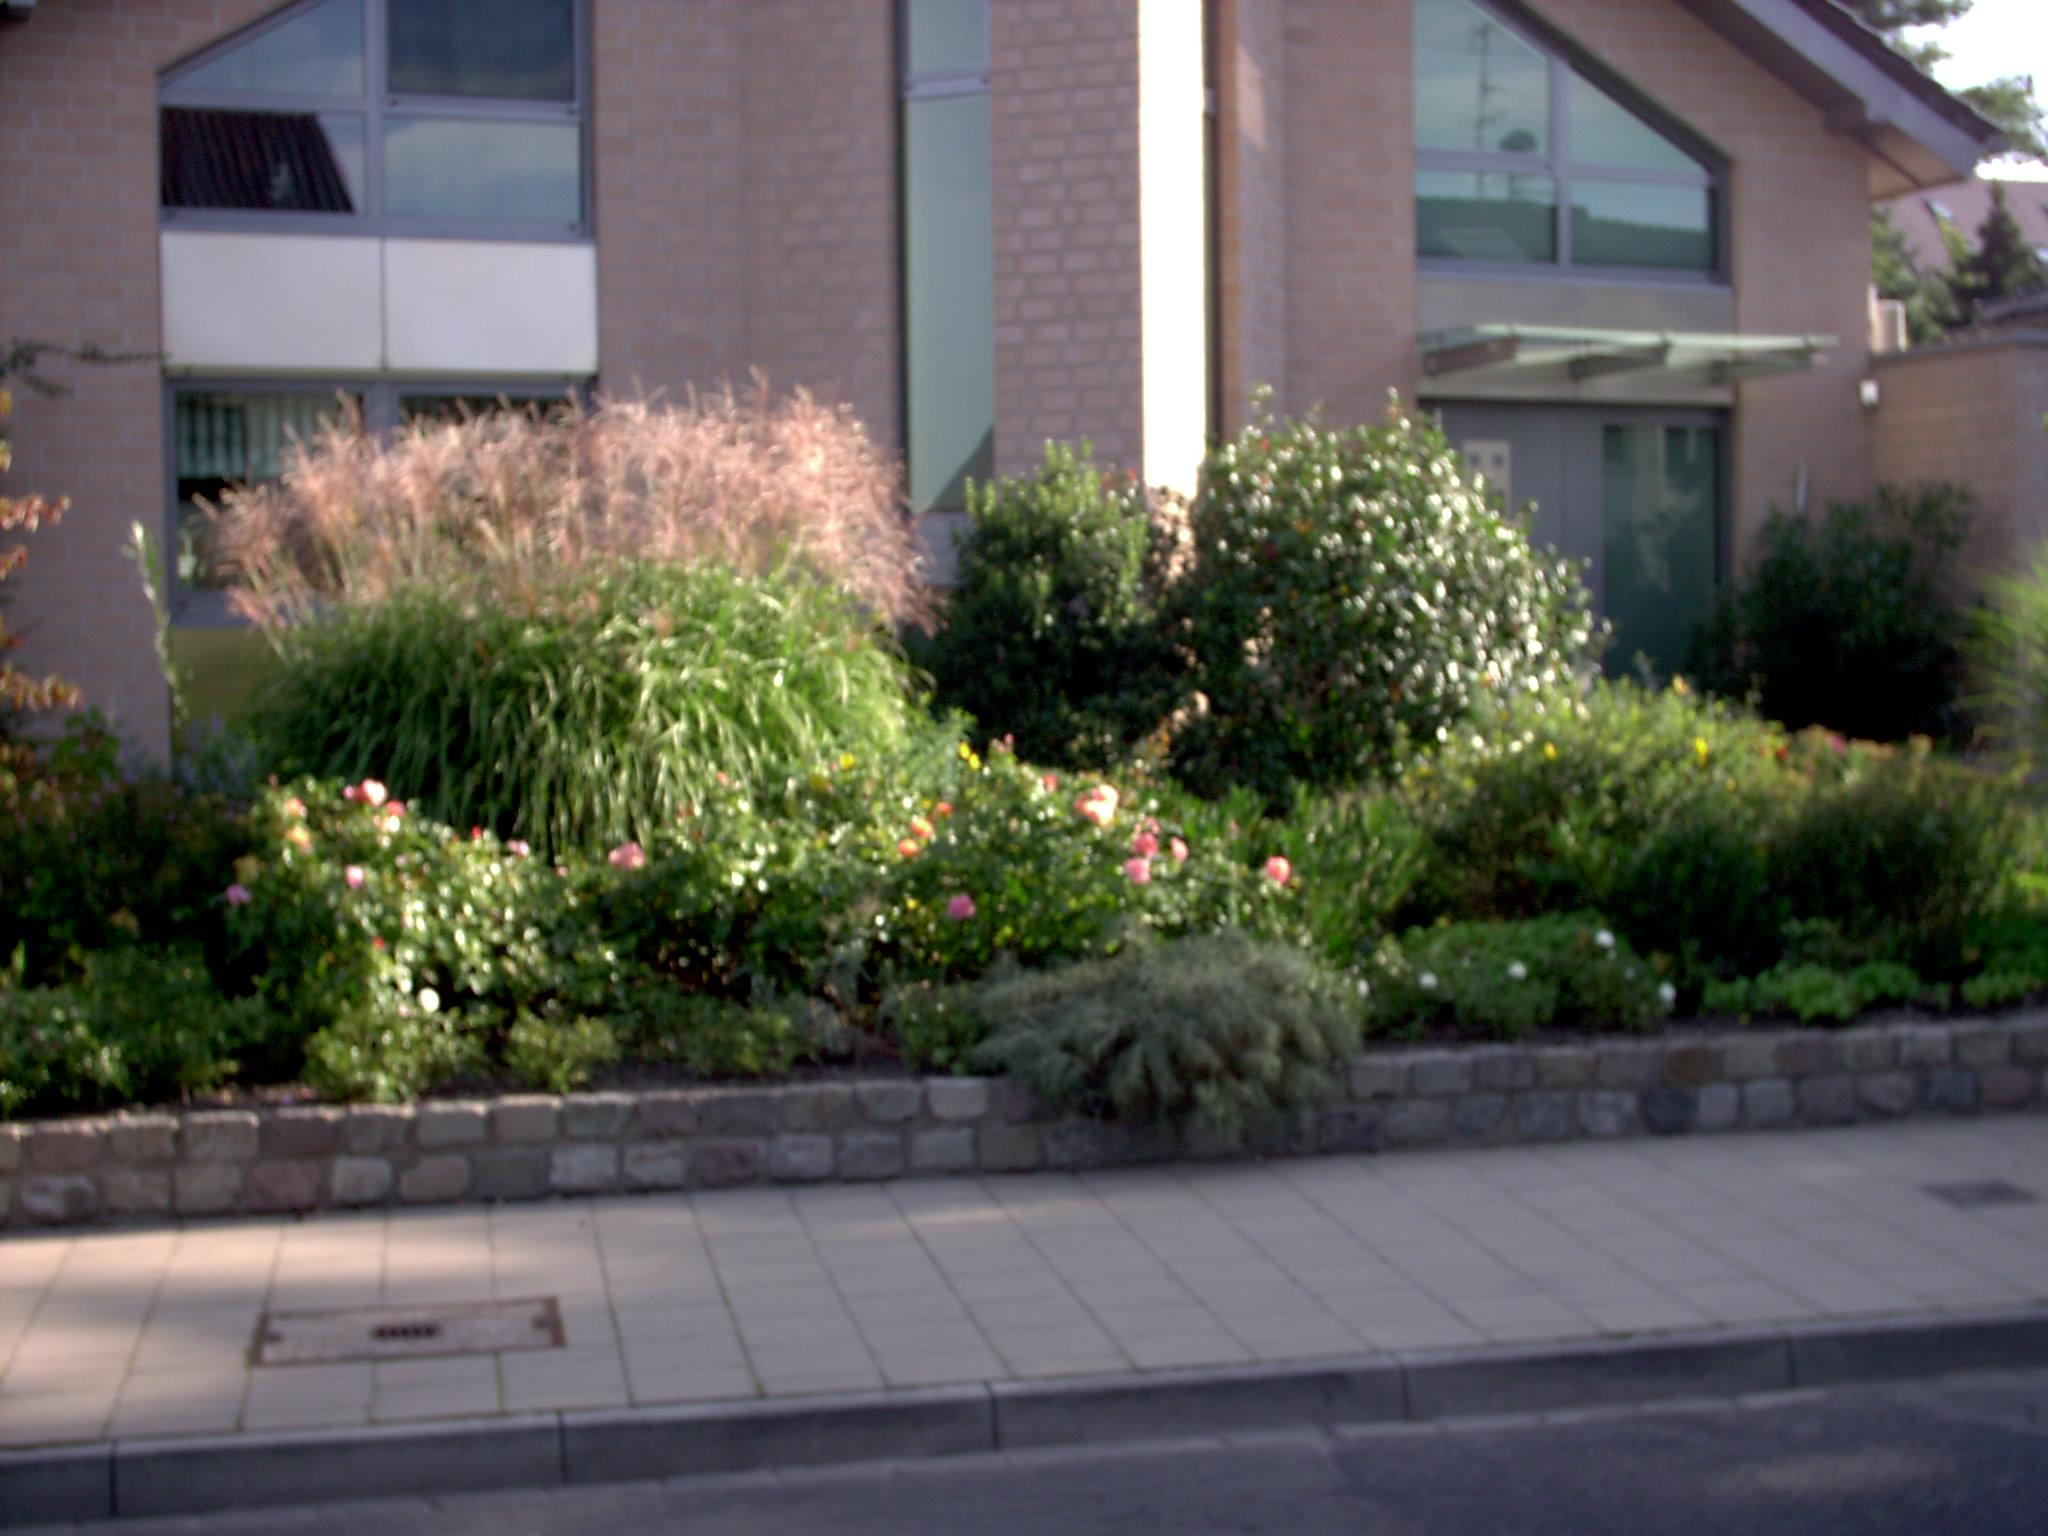 Gartenbau Düsseldorf gartenbau düsseldorf vom profi aus düsseldorf nrw gartenbau